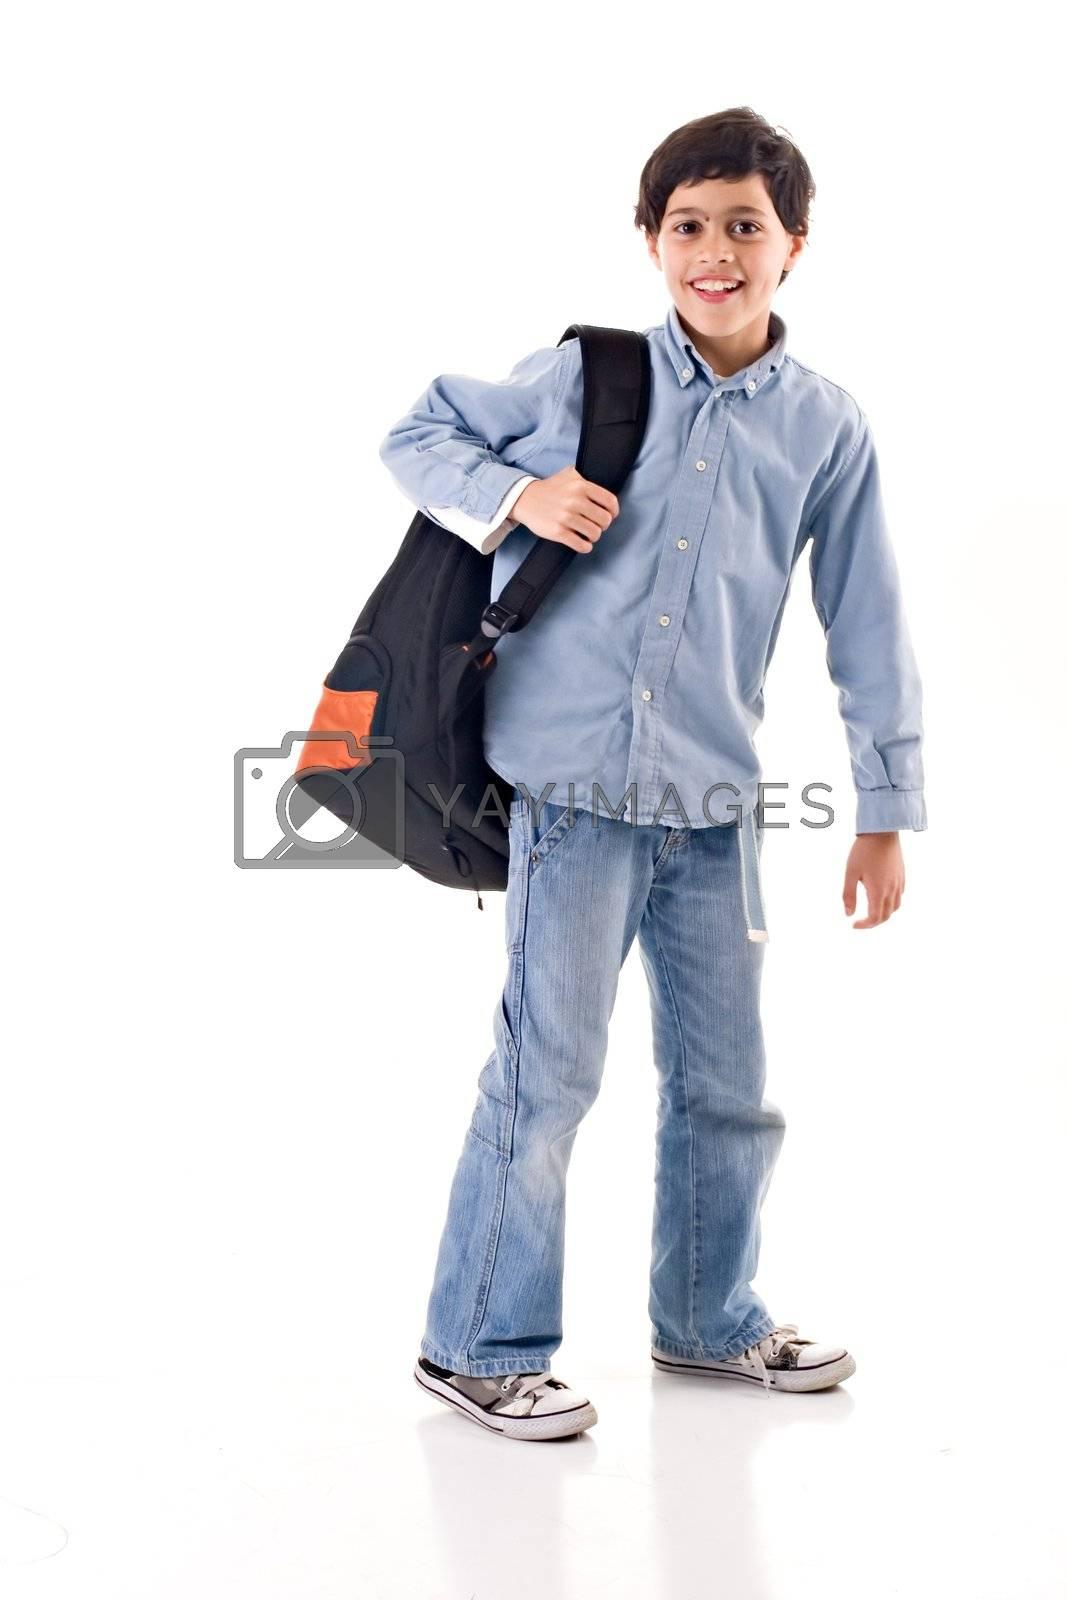 Royalty free image of School Boy by ajn